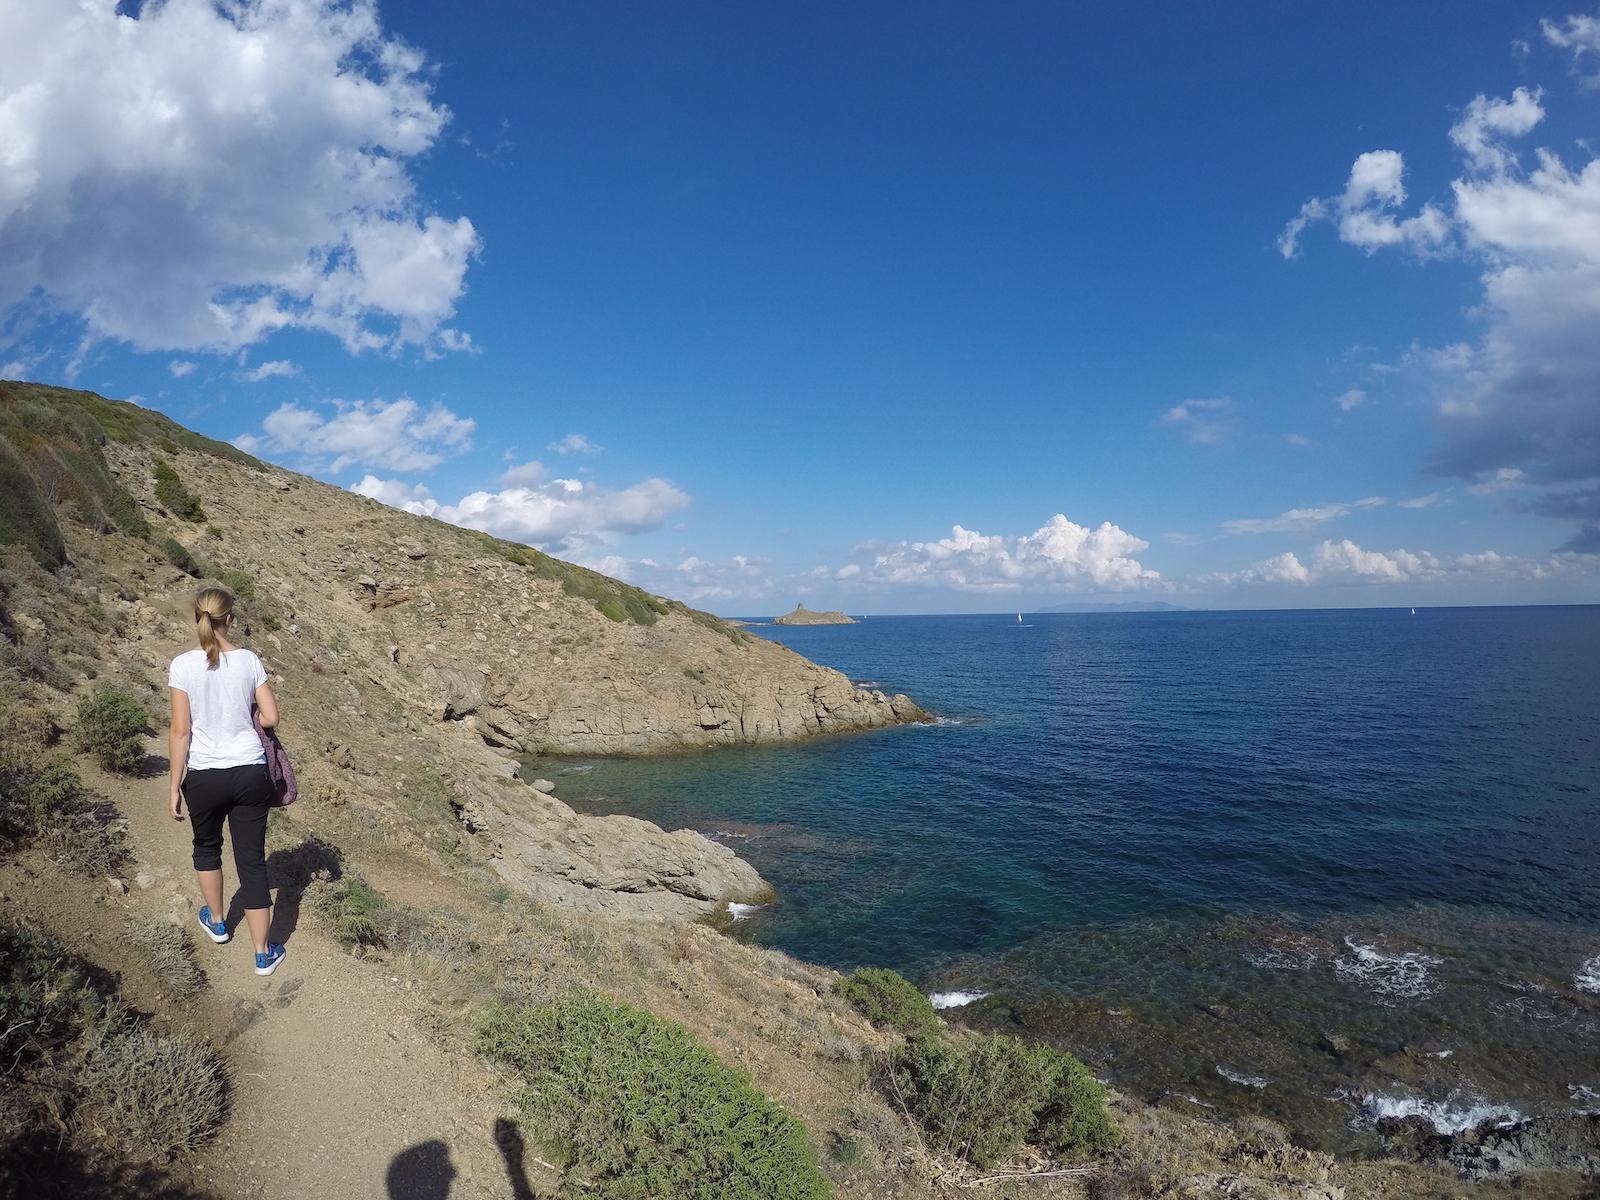 tourameo-trip-planning-minimoon-europe-corse-trekking